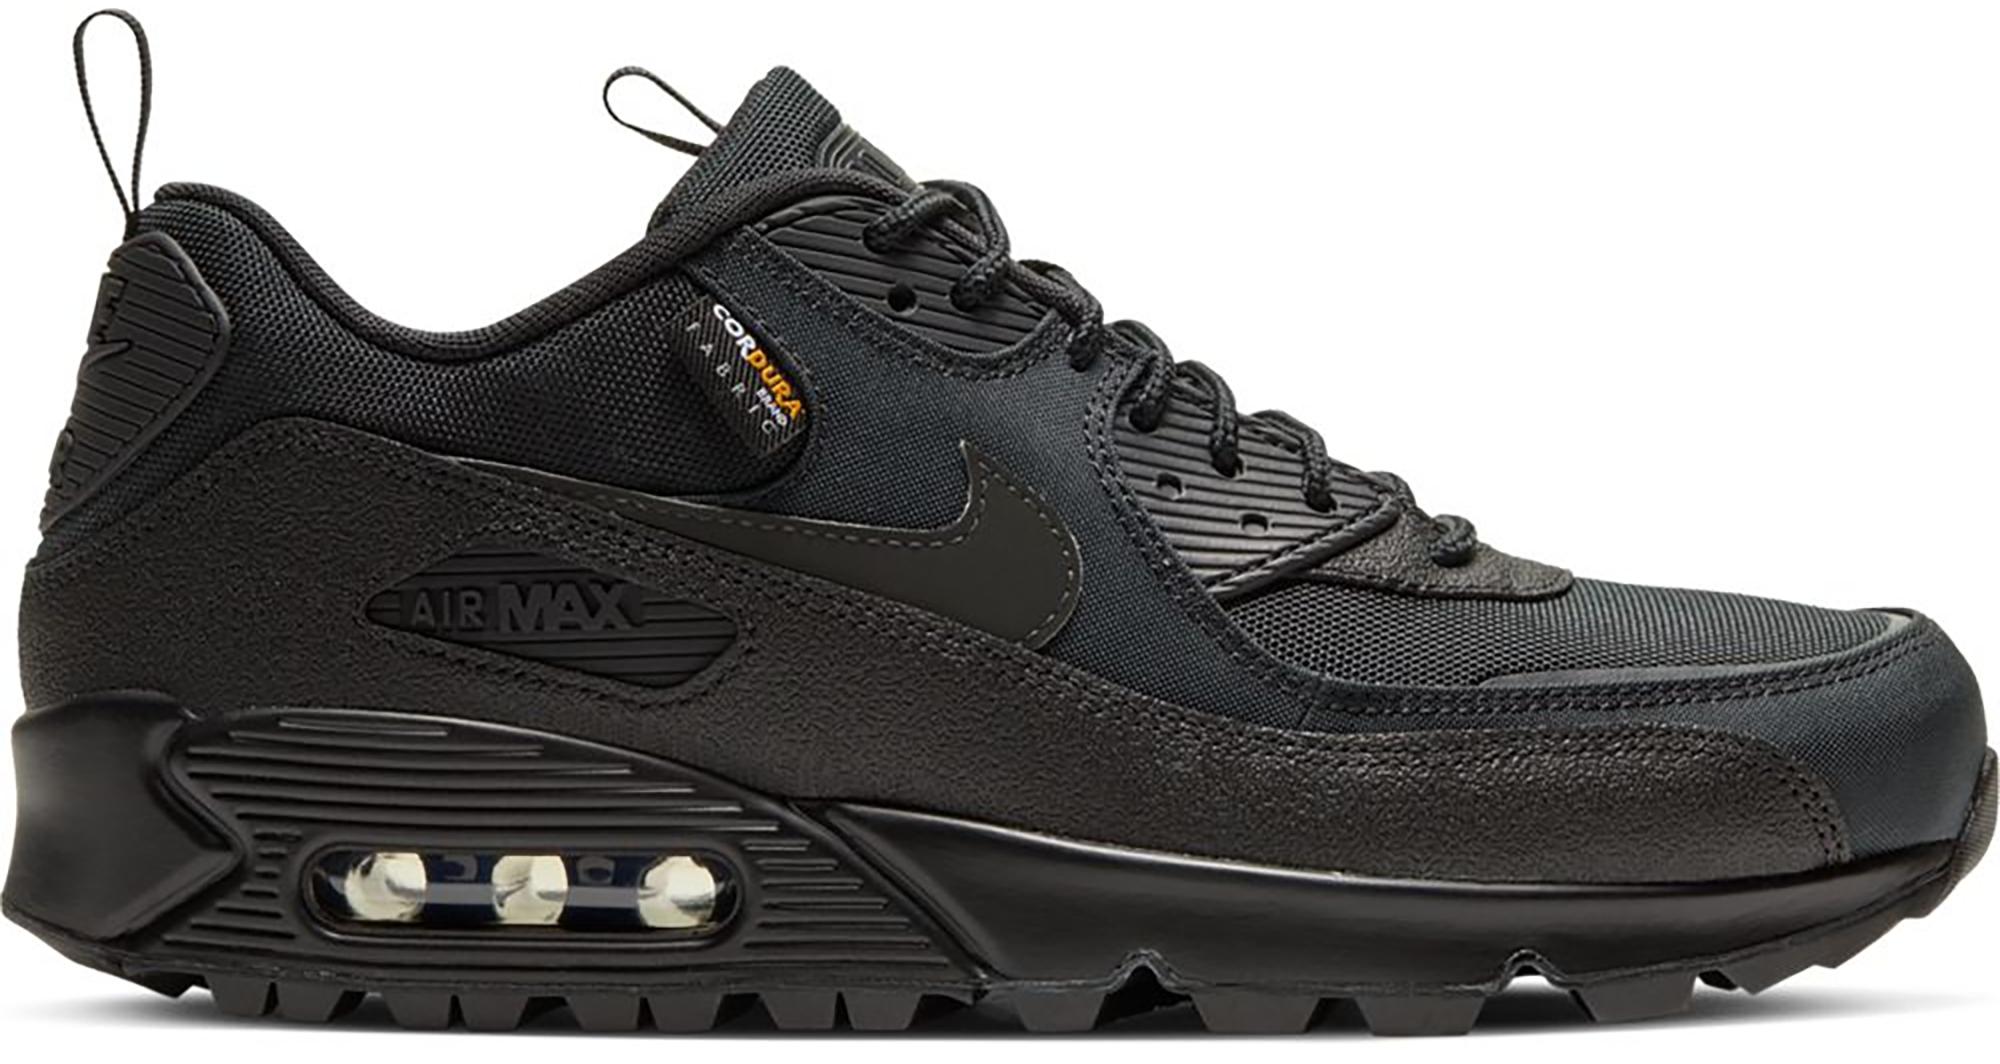 Nike Air Max 90 Surplus Black - CQ7743-001